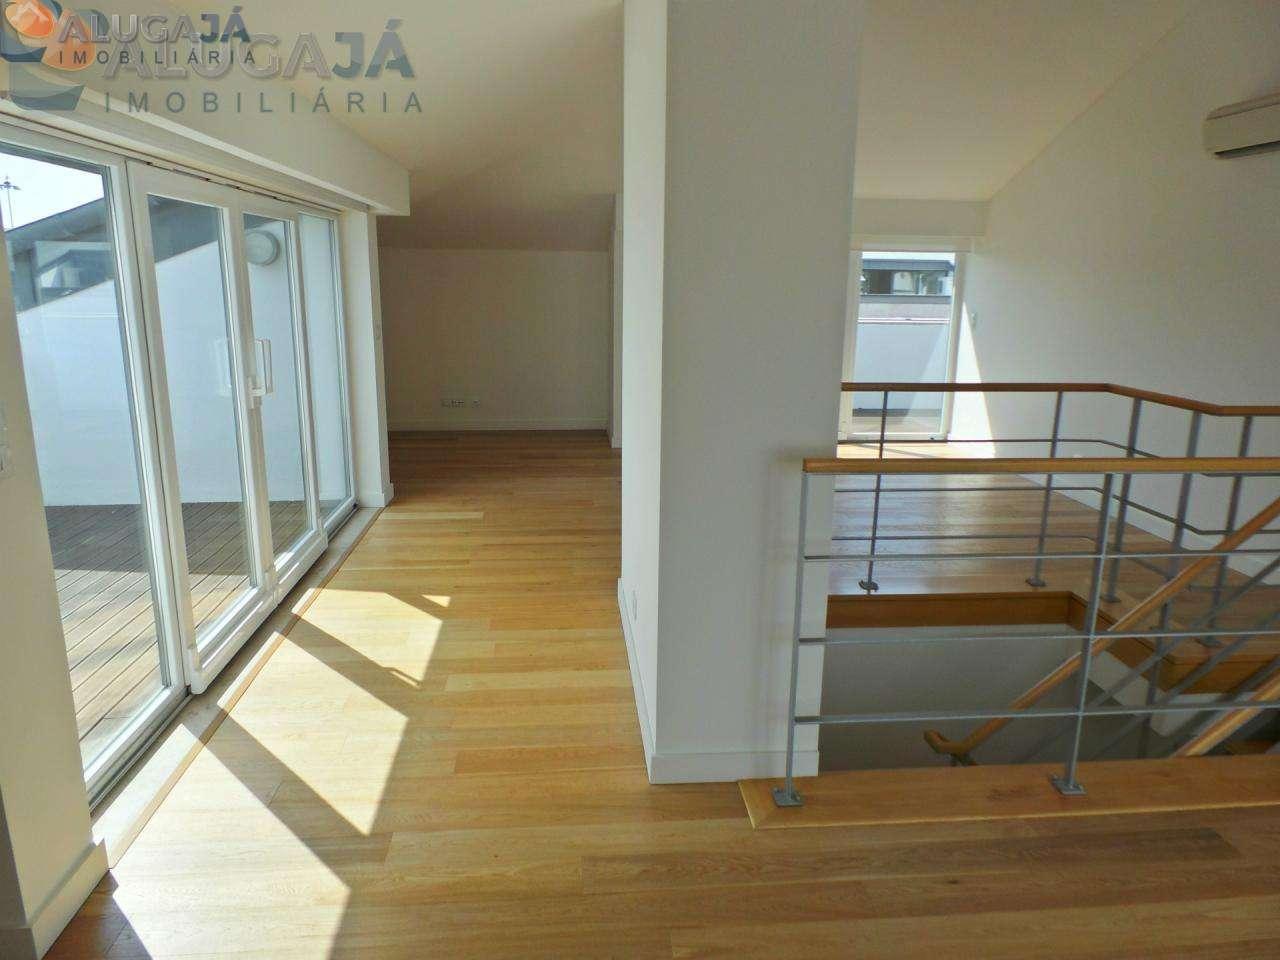 Apartamento para comprar, Belém, Lisboa - Foto 22